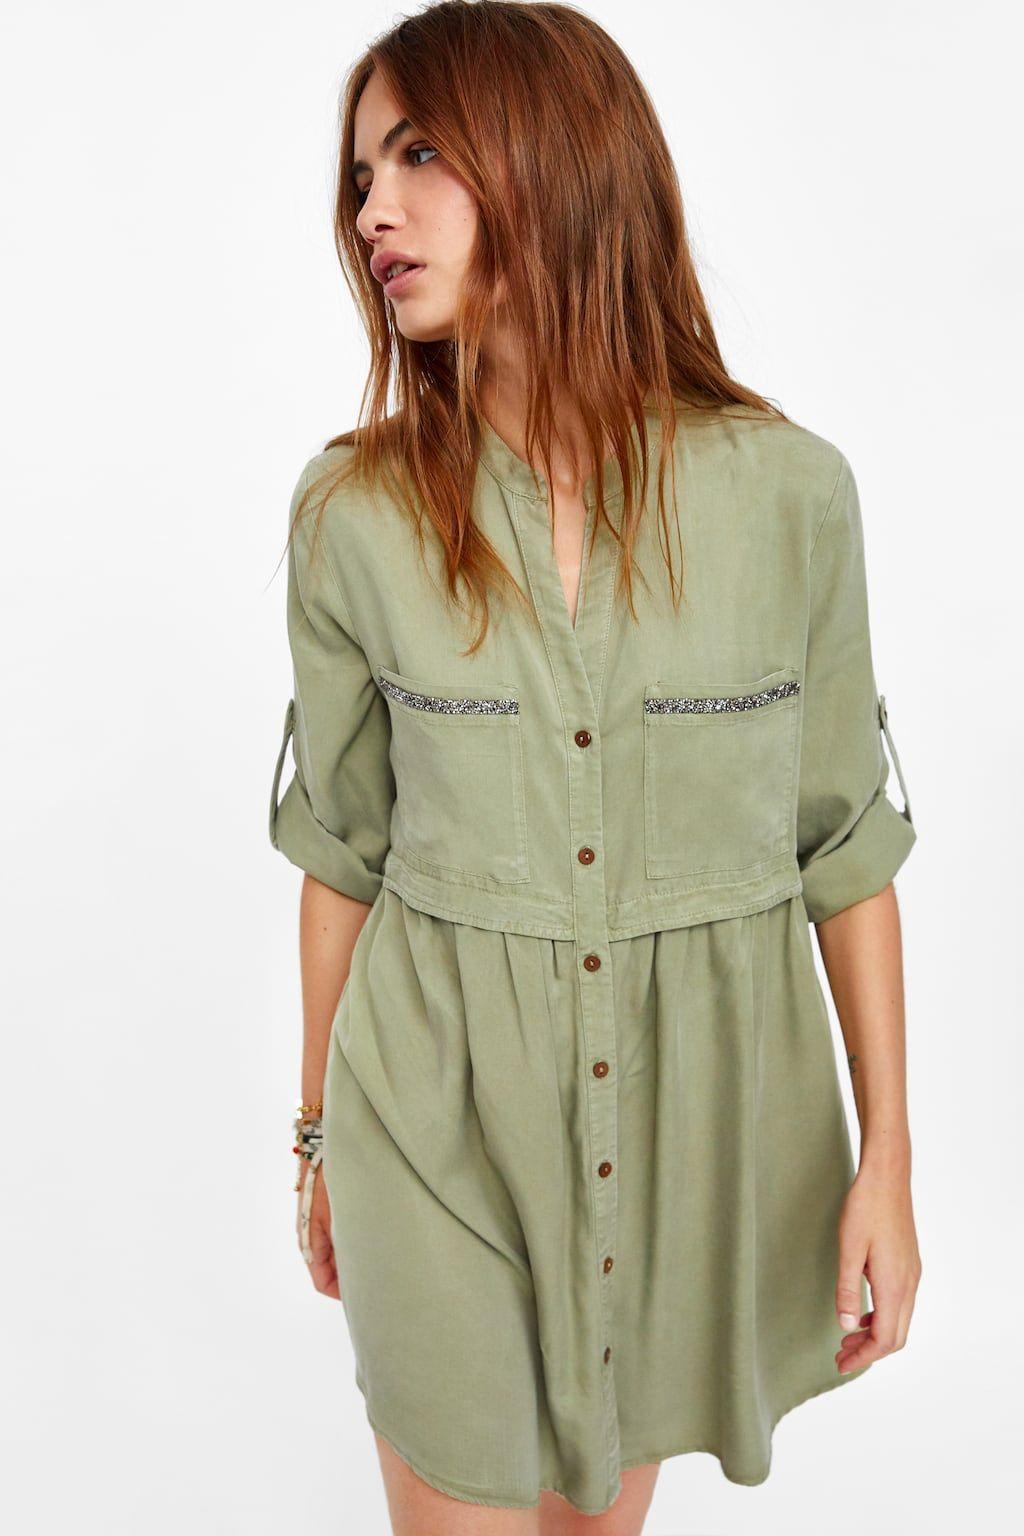 77198c8c495 Image 4 of BEADED SHIRT DRESS from Zara